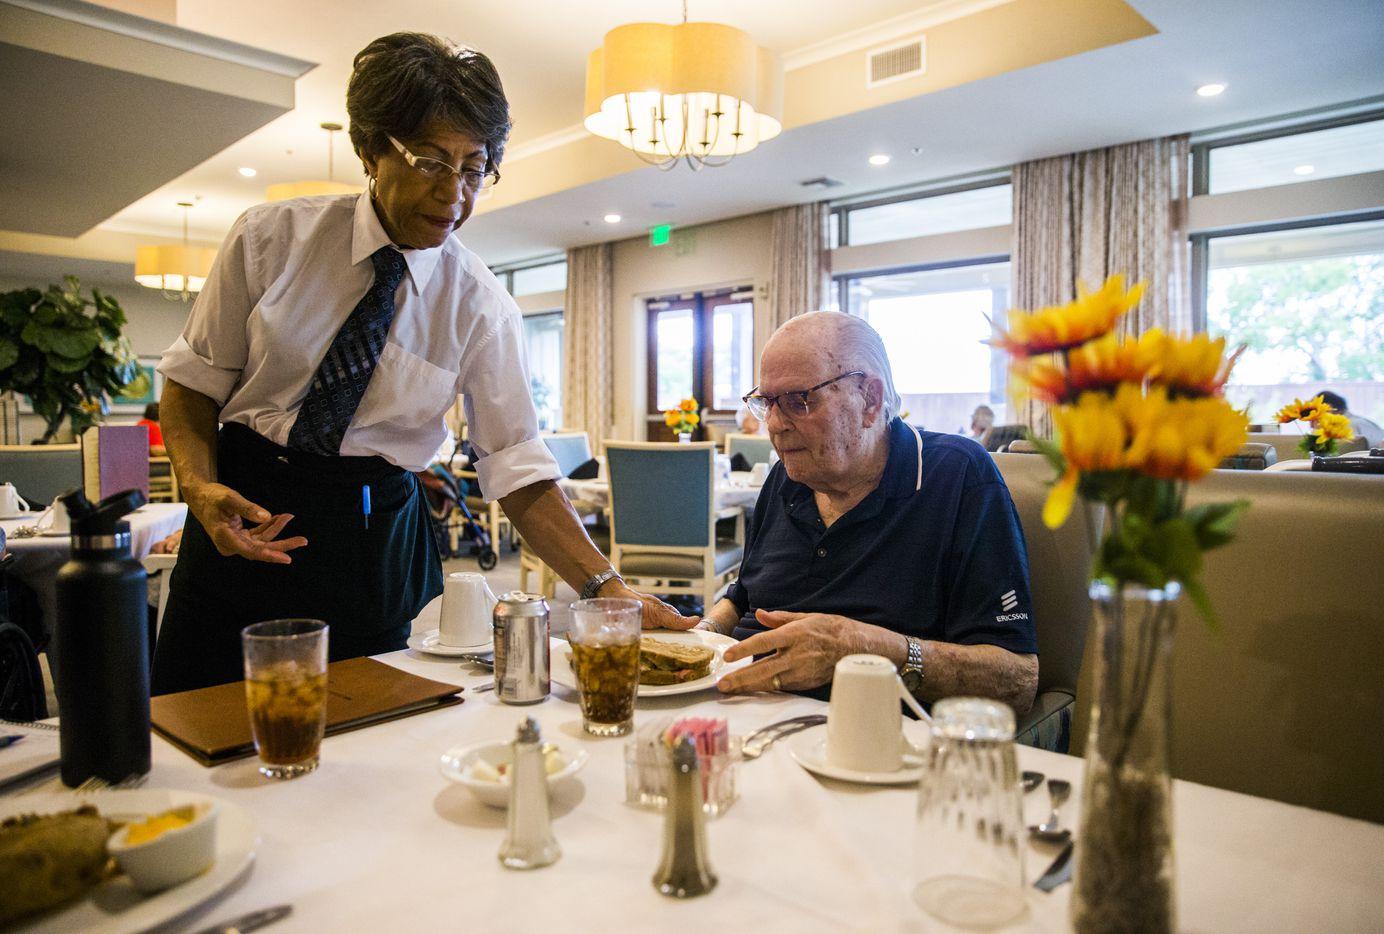 Bob Stiegler is served his favorite meal — a Reuben sandwich.